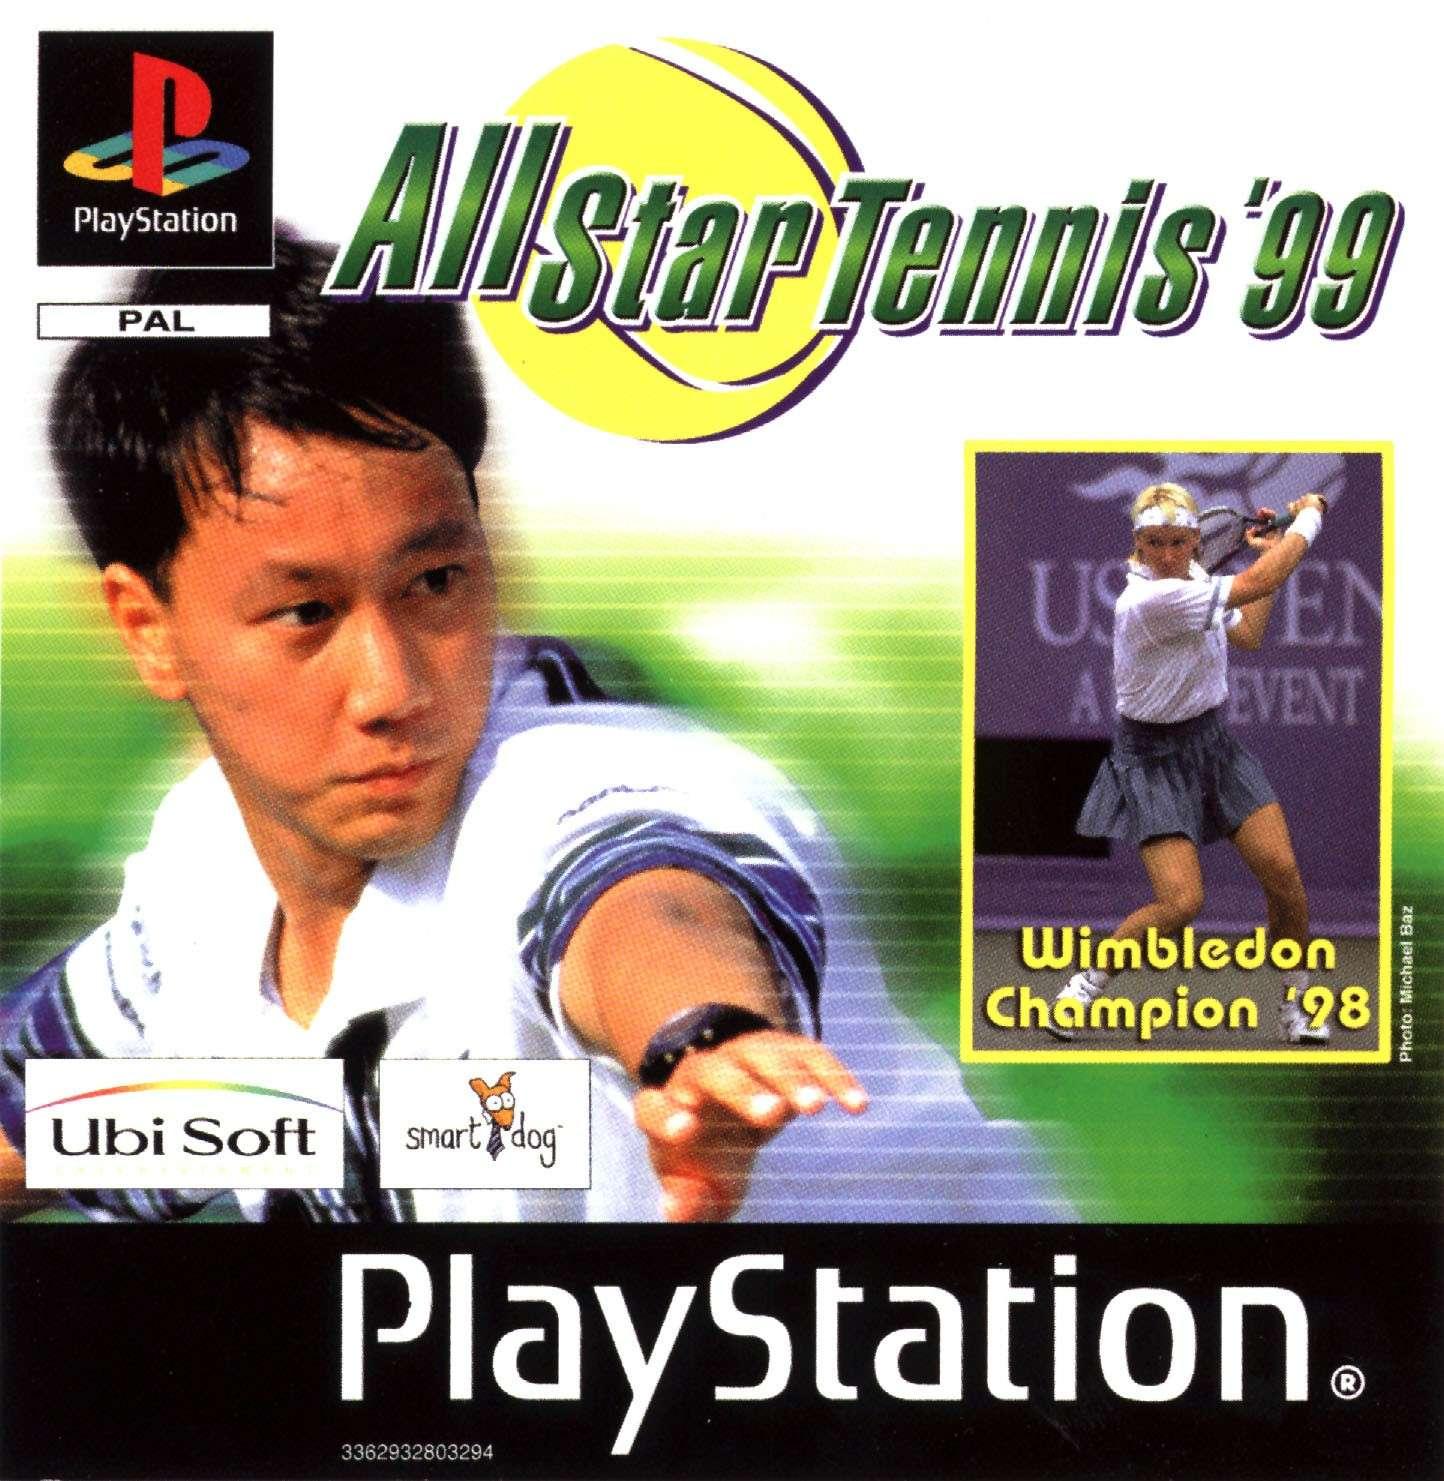 All Star Tennis 99 (PAL-MULTI5) All20s10